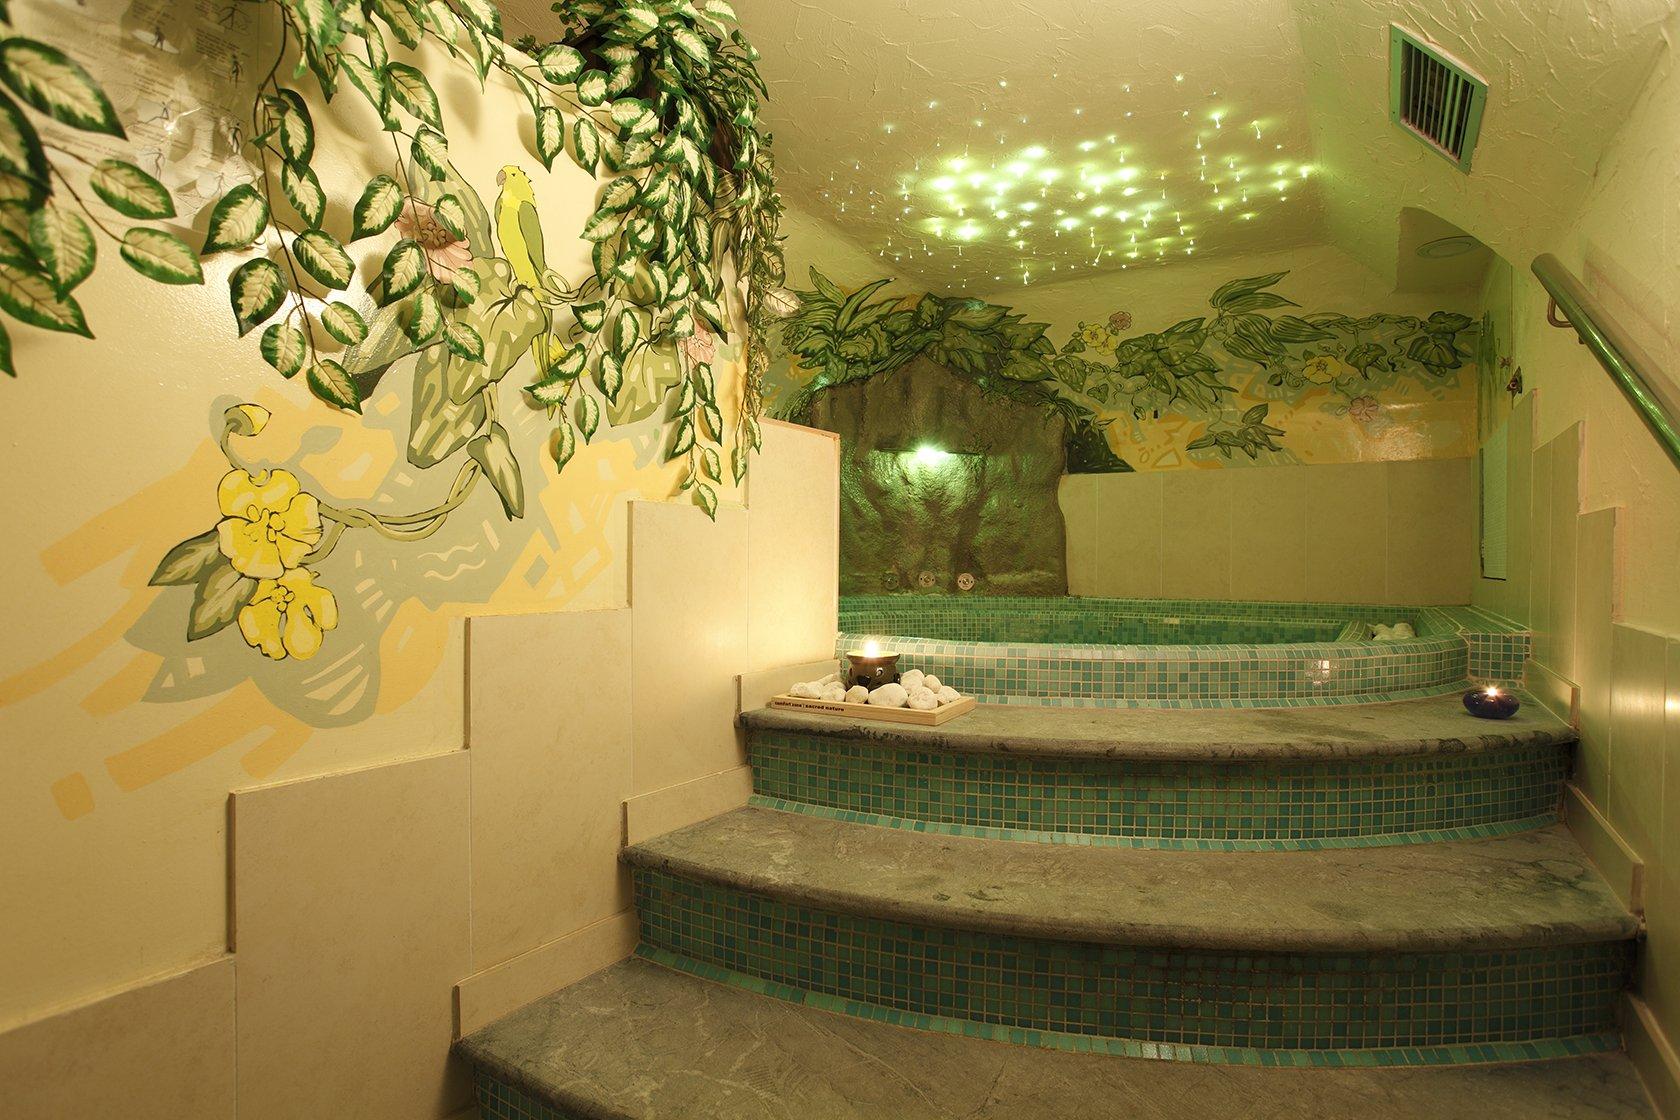 Hotel Villa Emma - Vasca idromassaggio